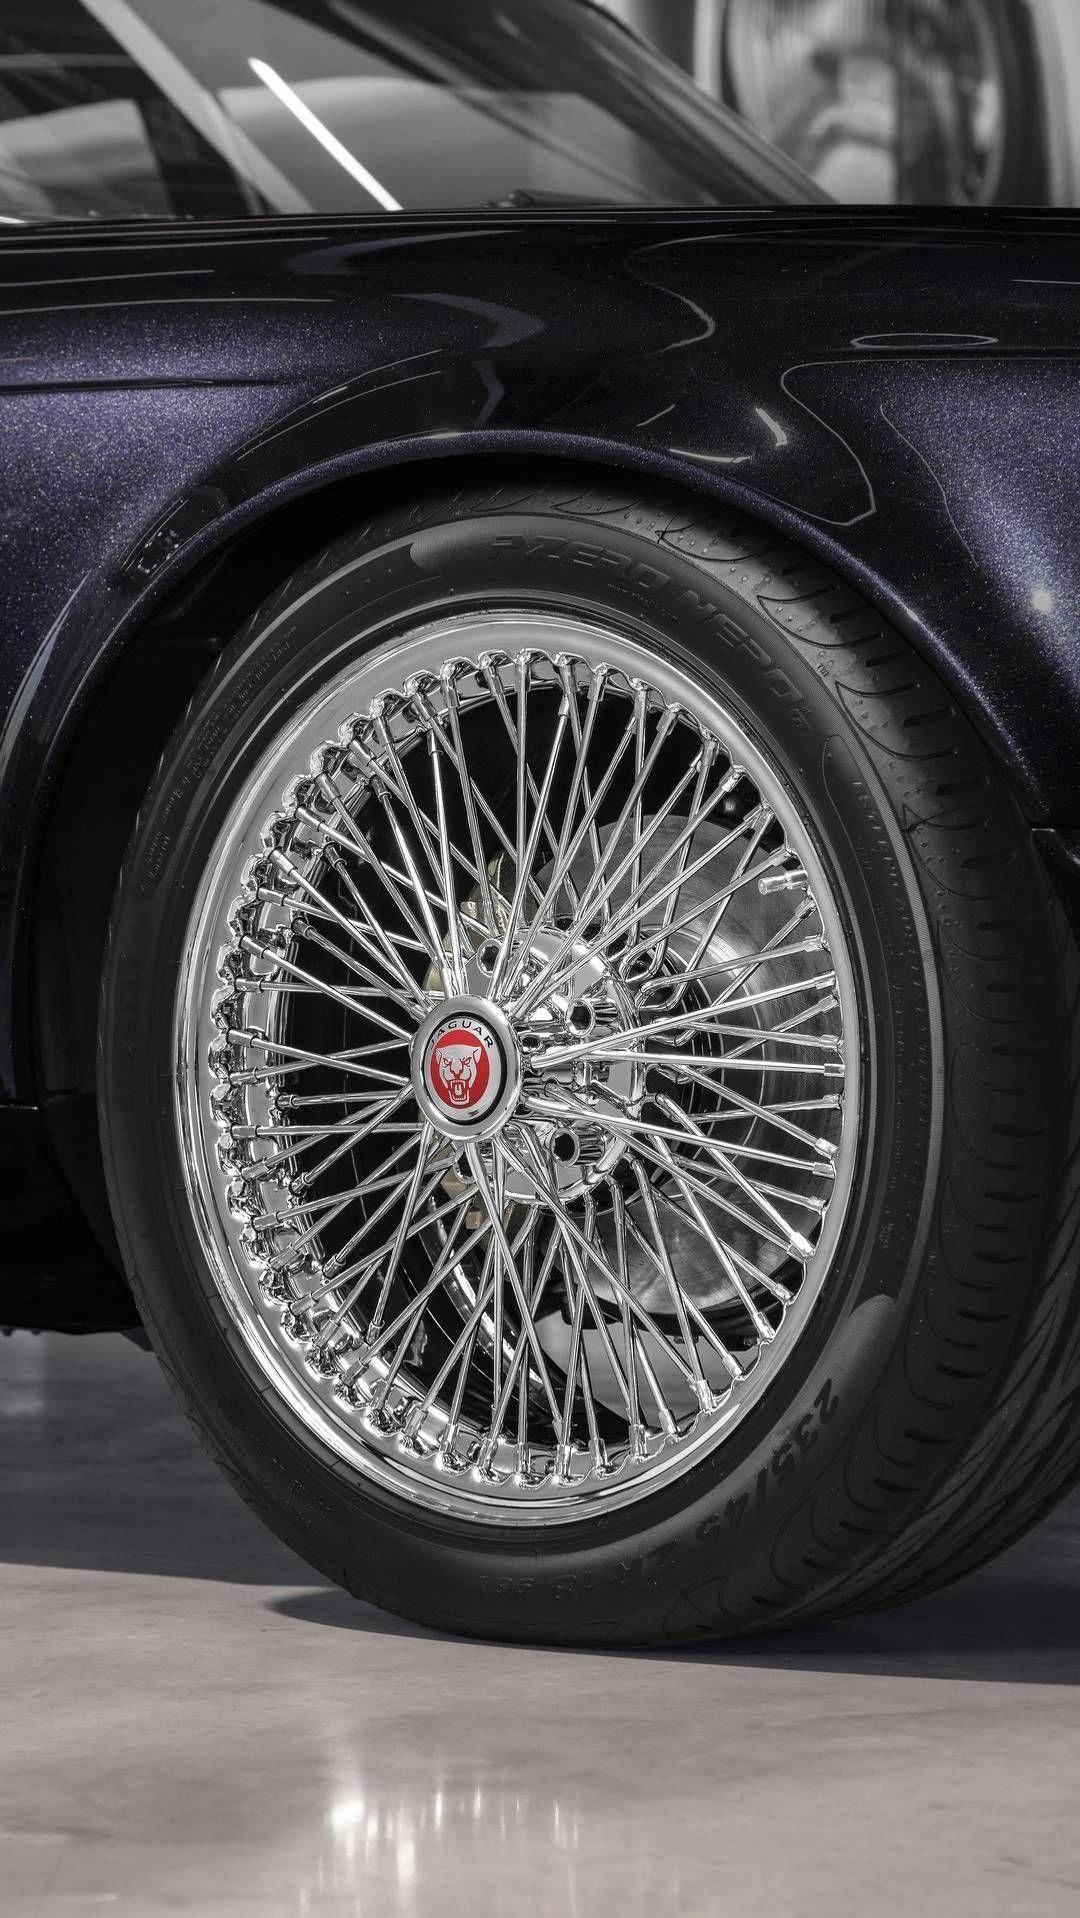 jaguar classic cars blue #Jaguarclassiccars